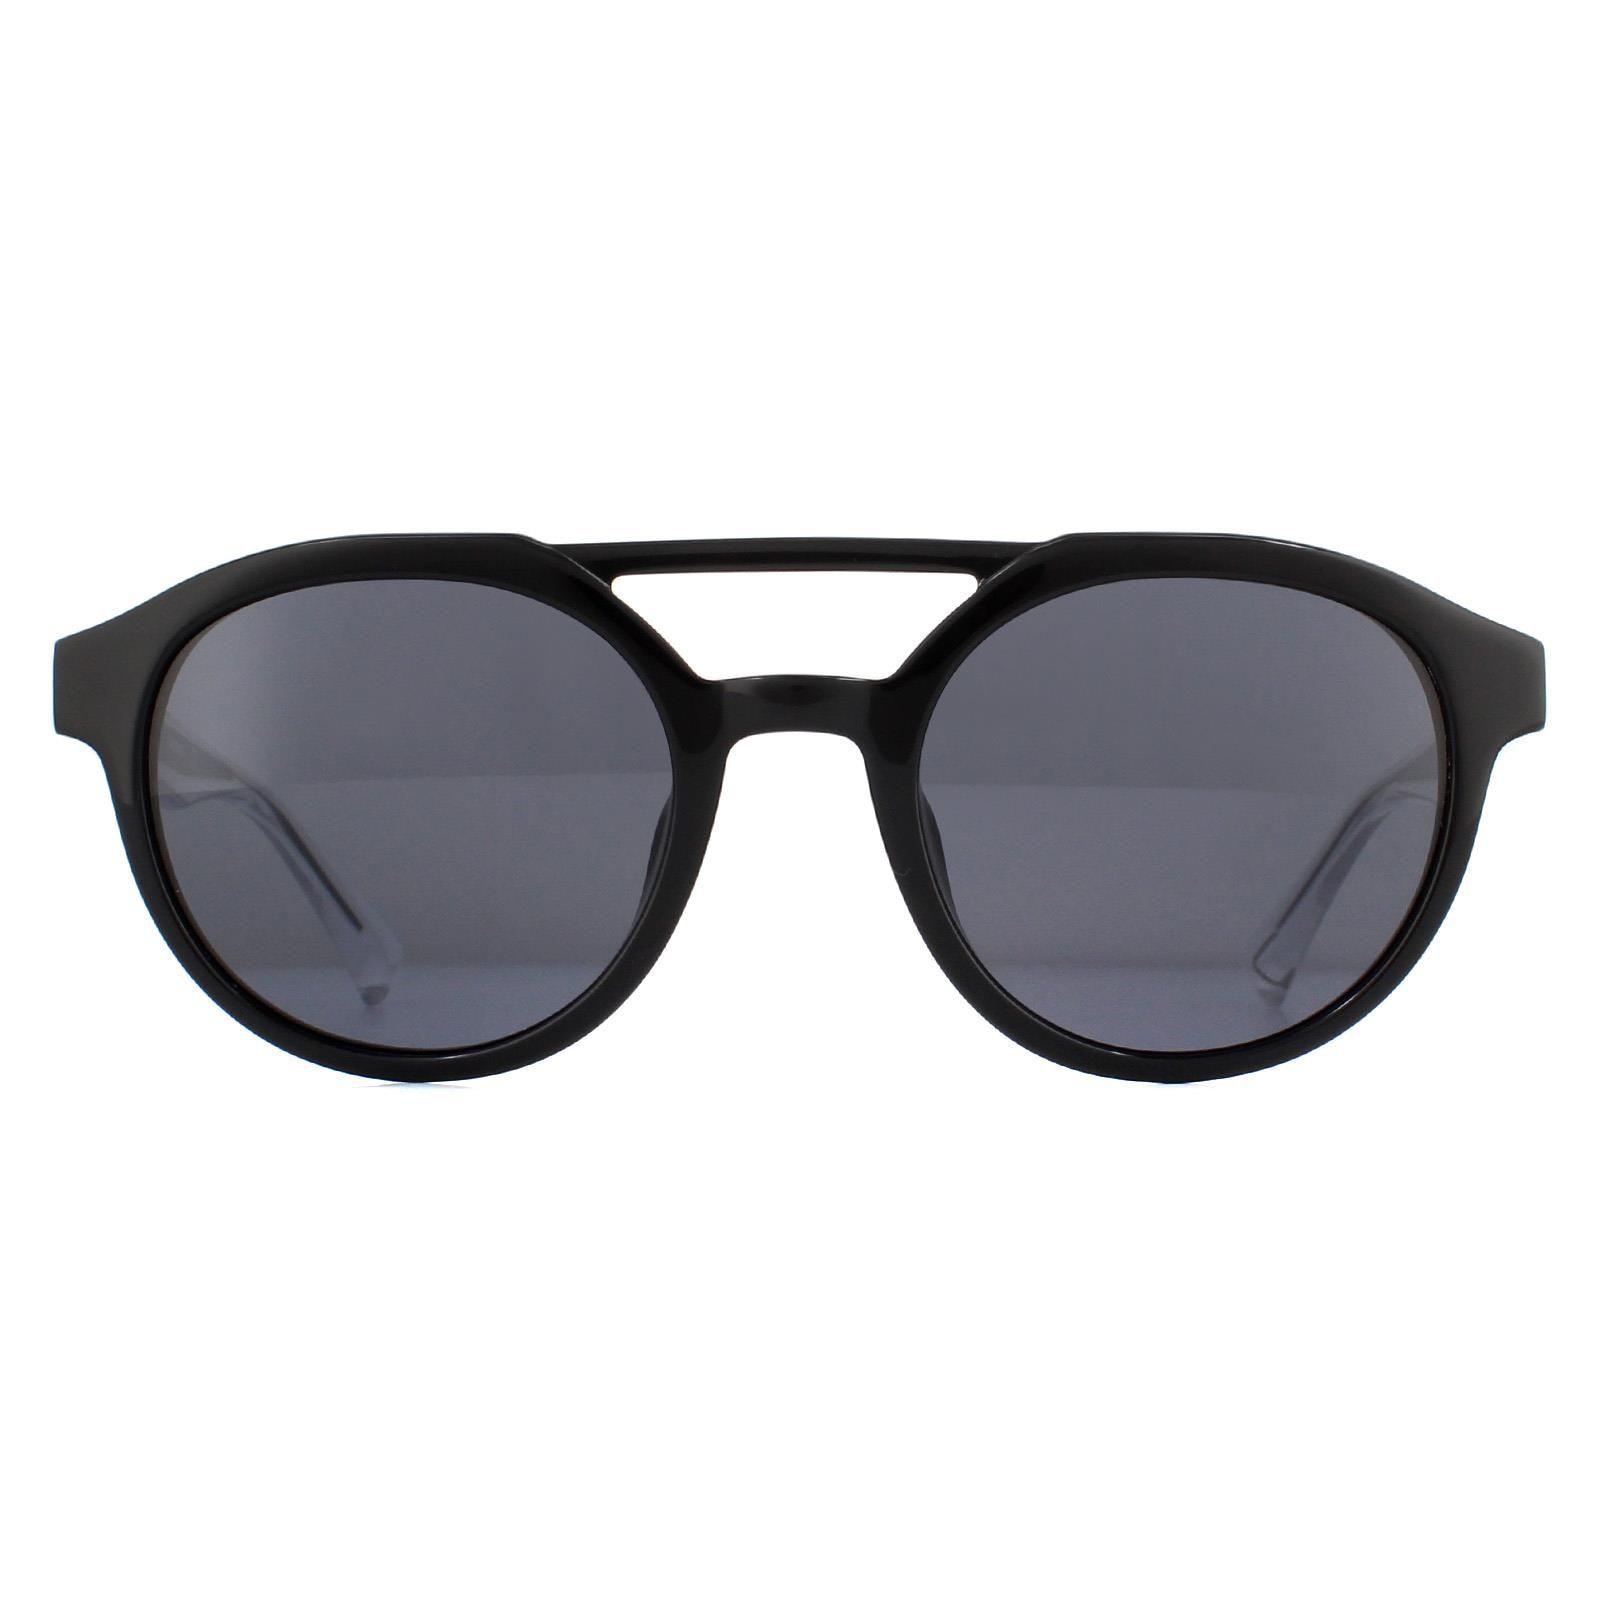 Diesel Sunglasses DL0280 01A Black Crystal Grey